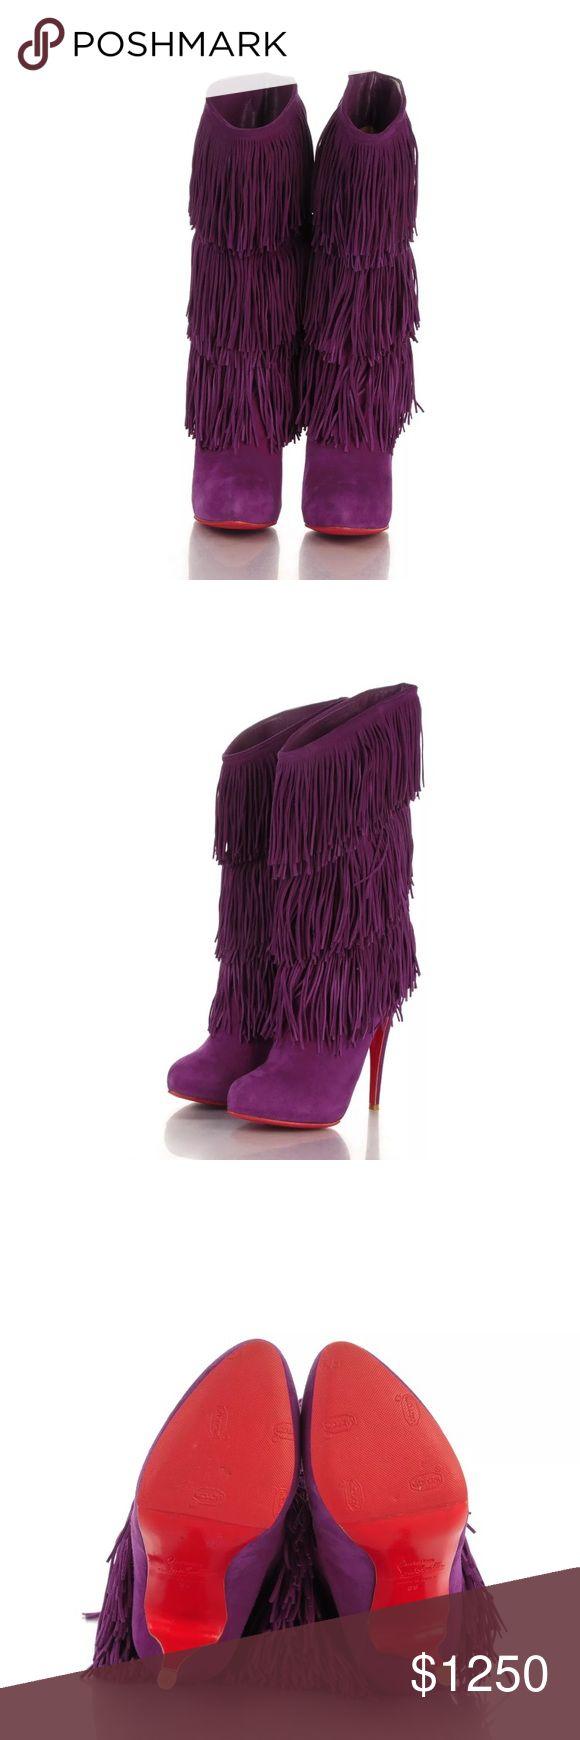 Christian Louboutin Forever Tina Fringe Boots